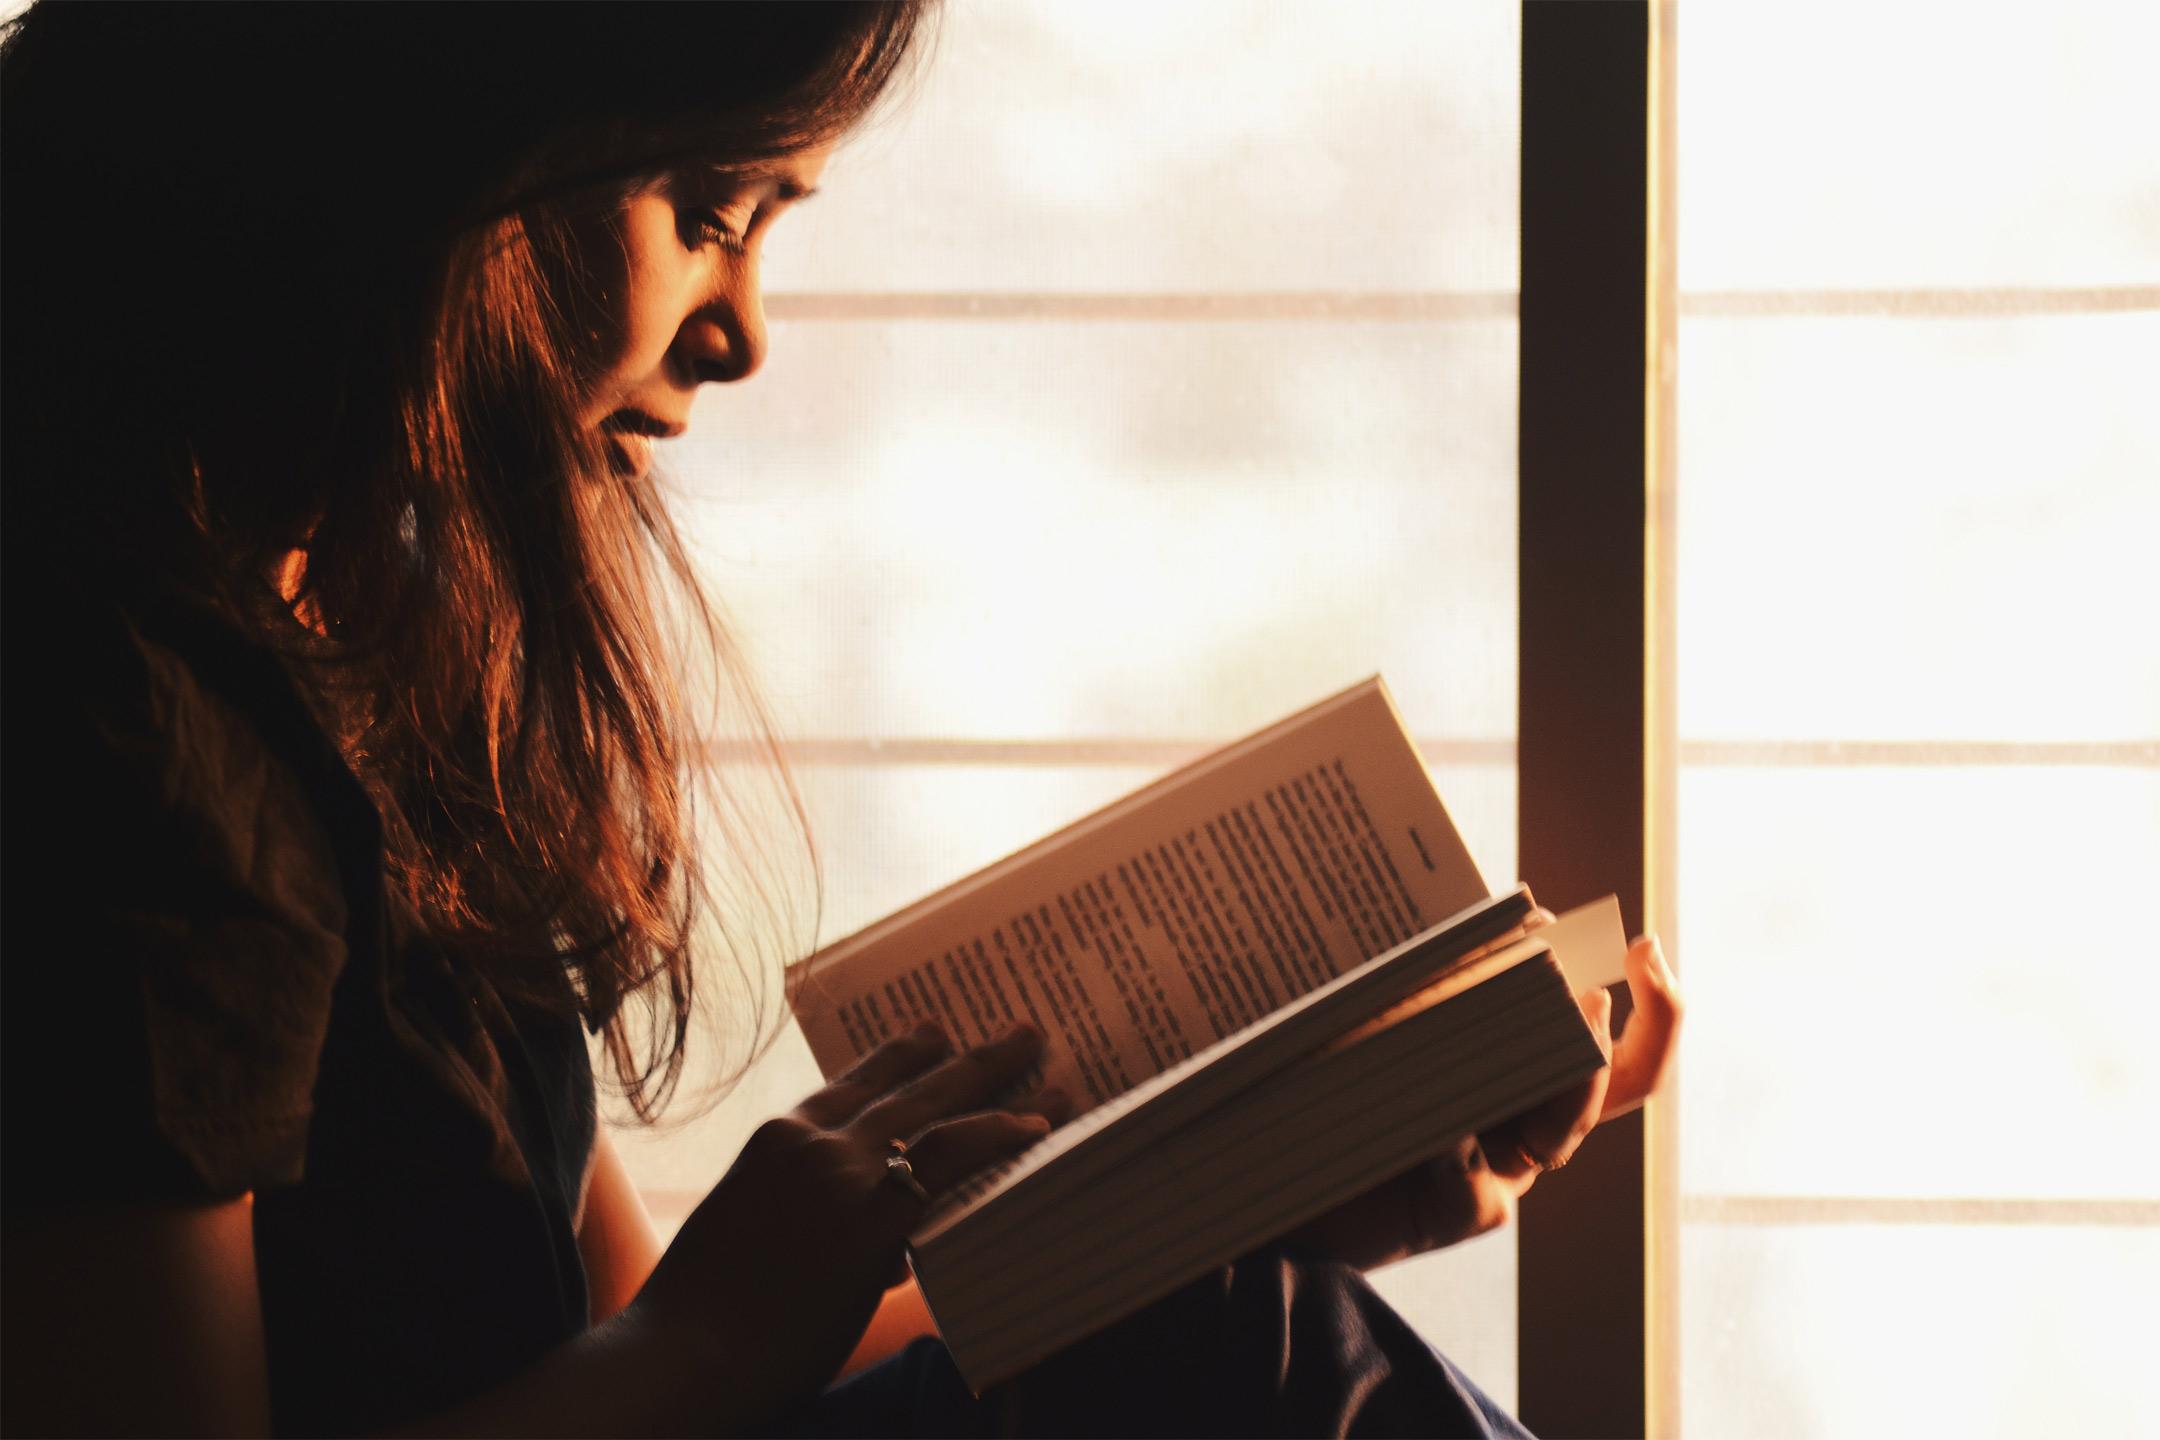 teen-reading-book2160